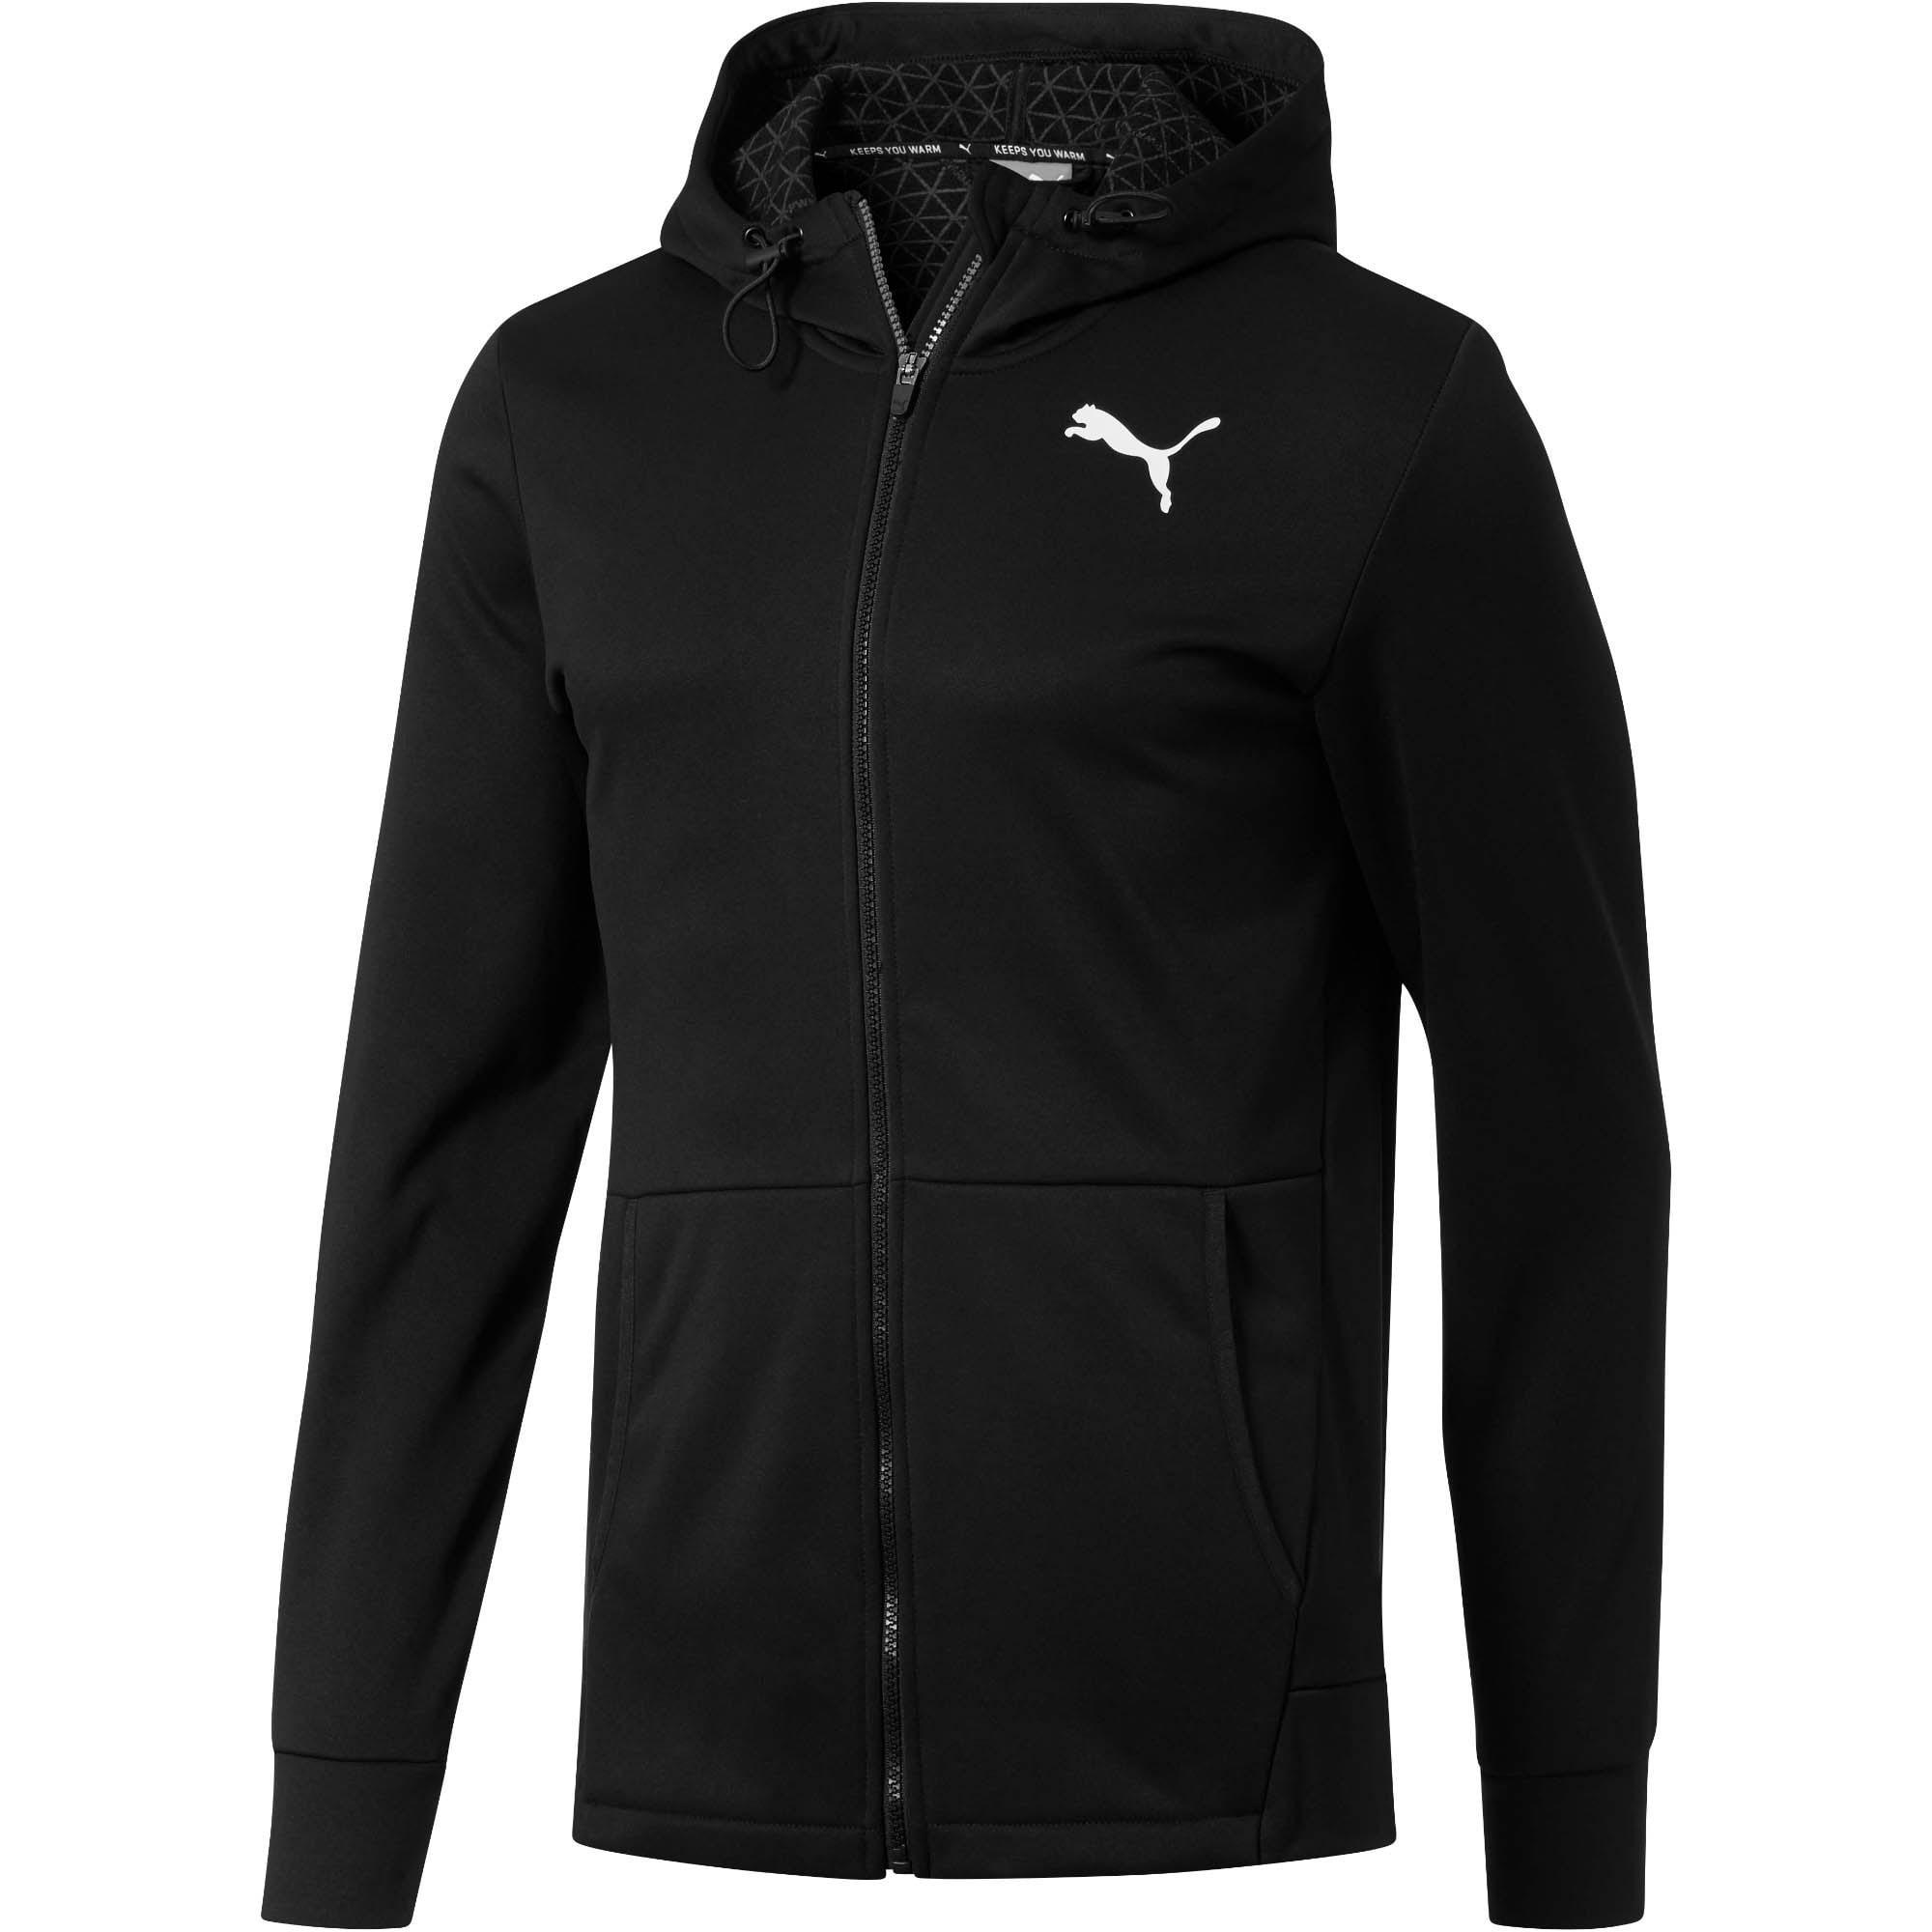 Thumbnail 1 of Tec Sports Warm Full-Zip Hoodie, Puma Black, medium